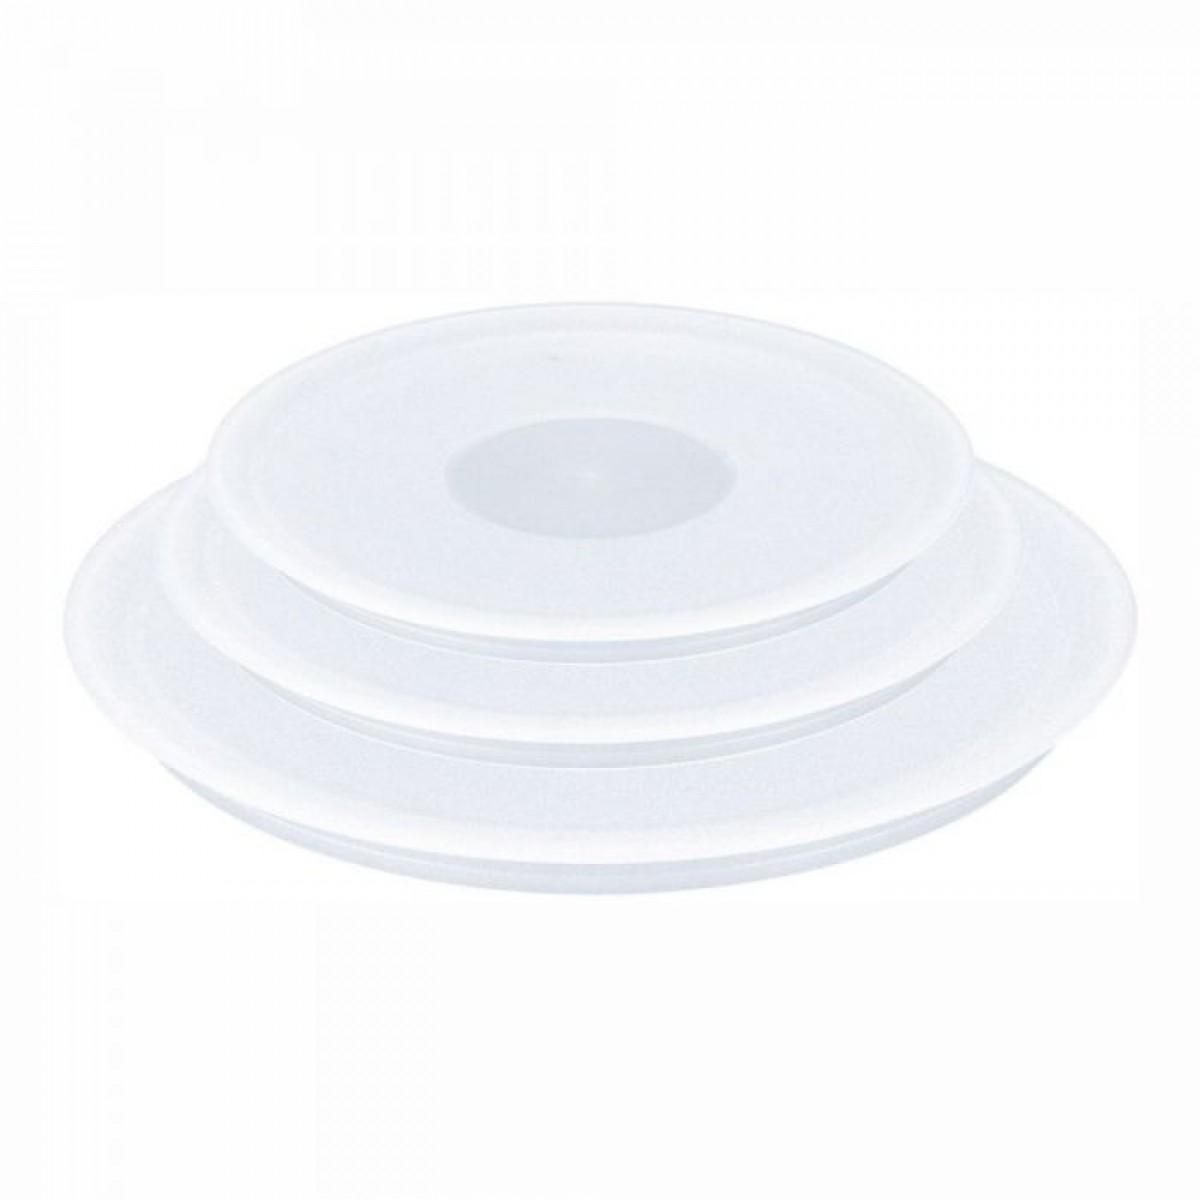 TEFAL Ingenio expertice plastlågsæt 3 stk